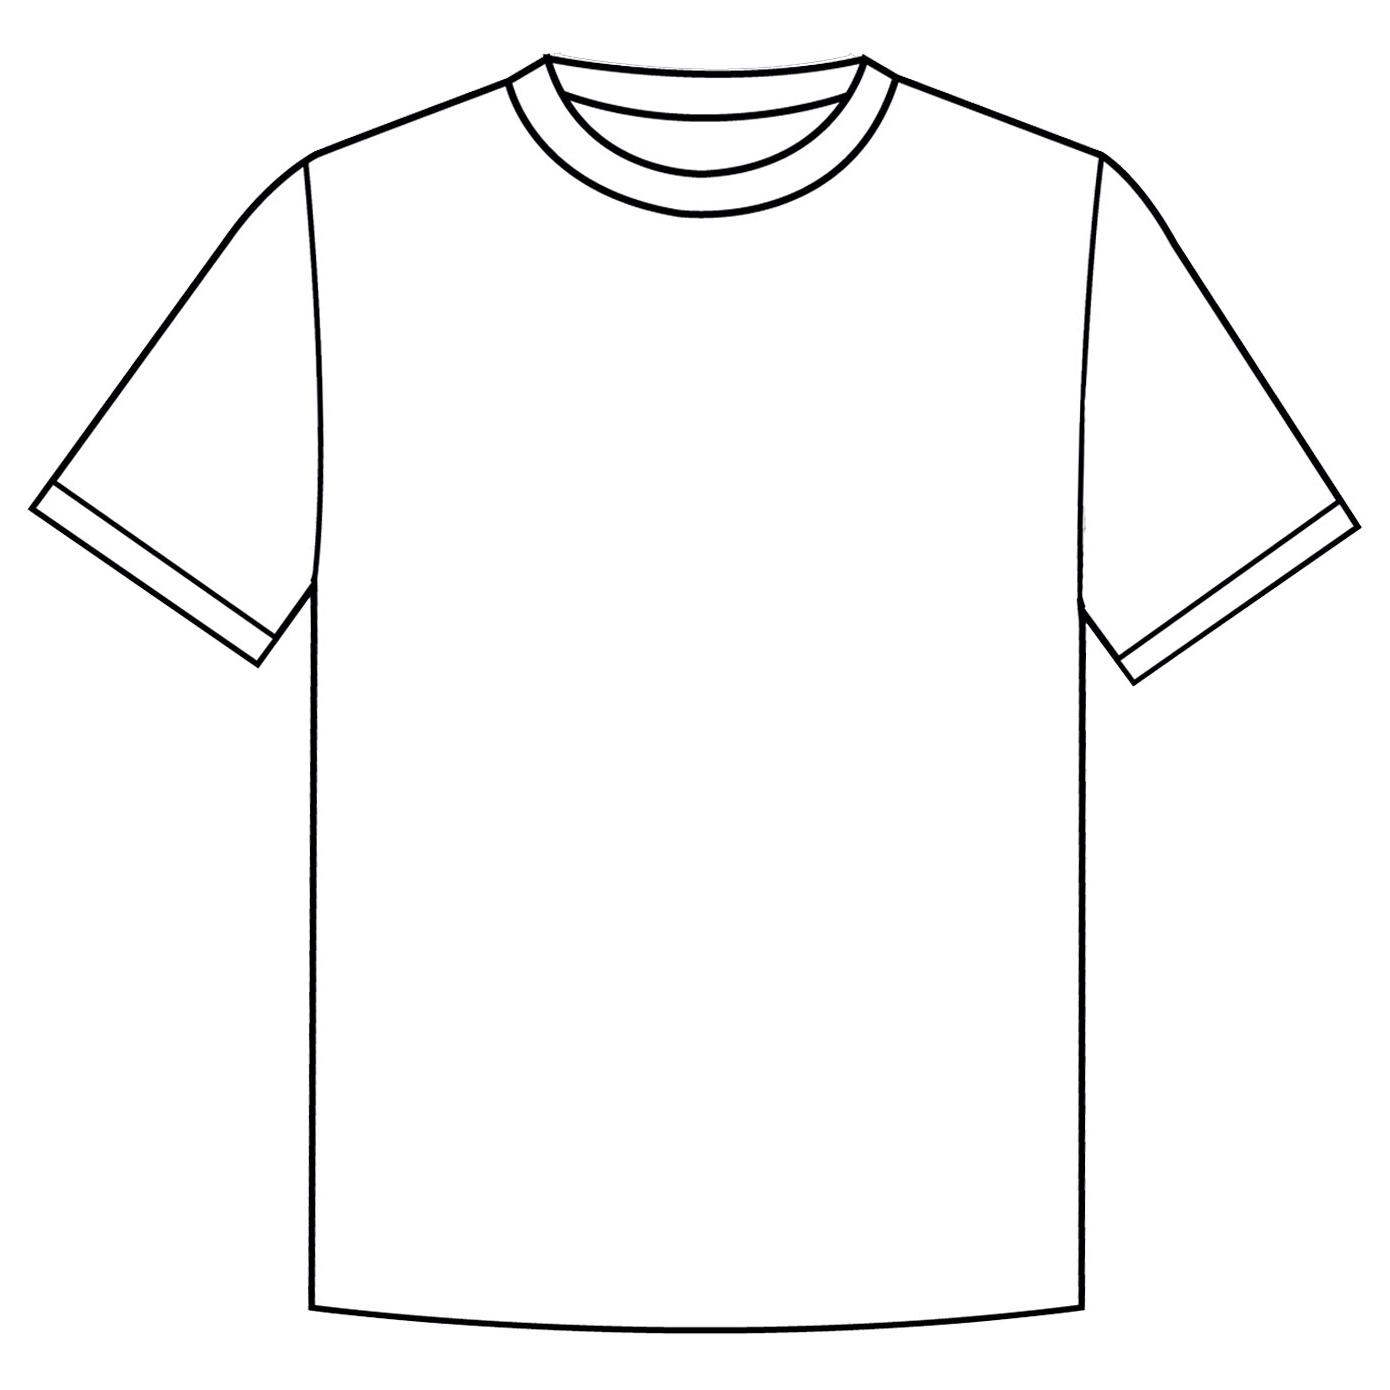 Coldplay pede ajuda para arte de camisa! - Viva Coldplay